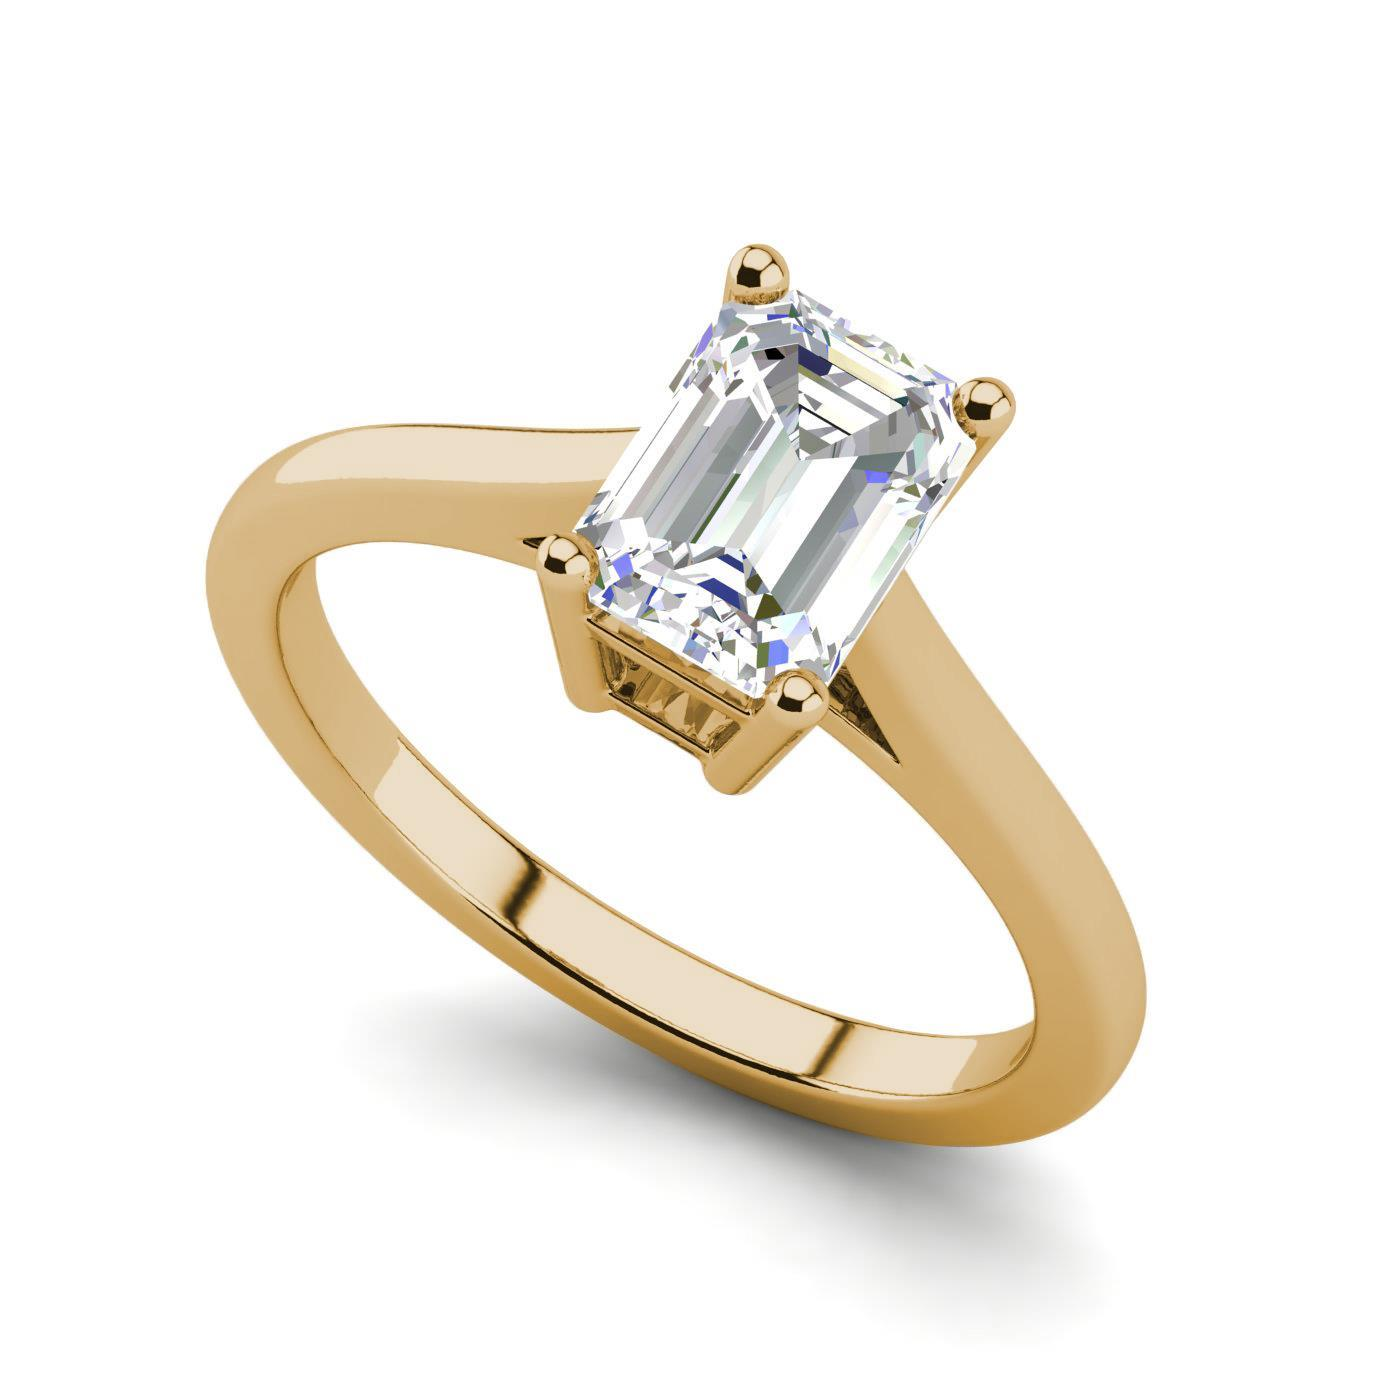 4 Prong 0 5 Carat Vs2 H Emerald Cut Diamond Engagement Ring Yellow Gold Ebay